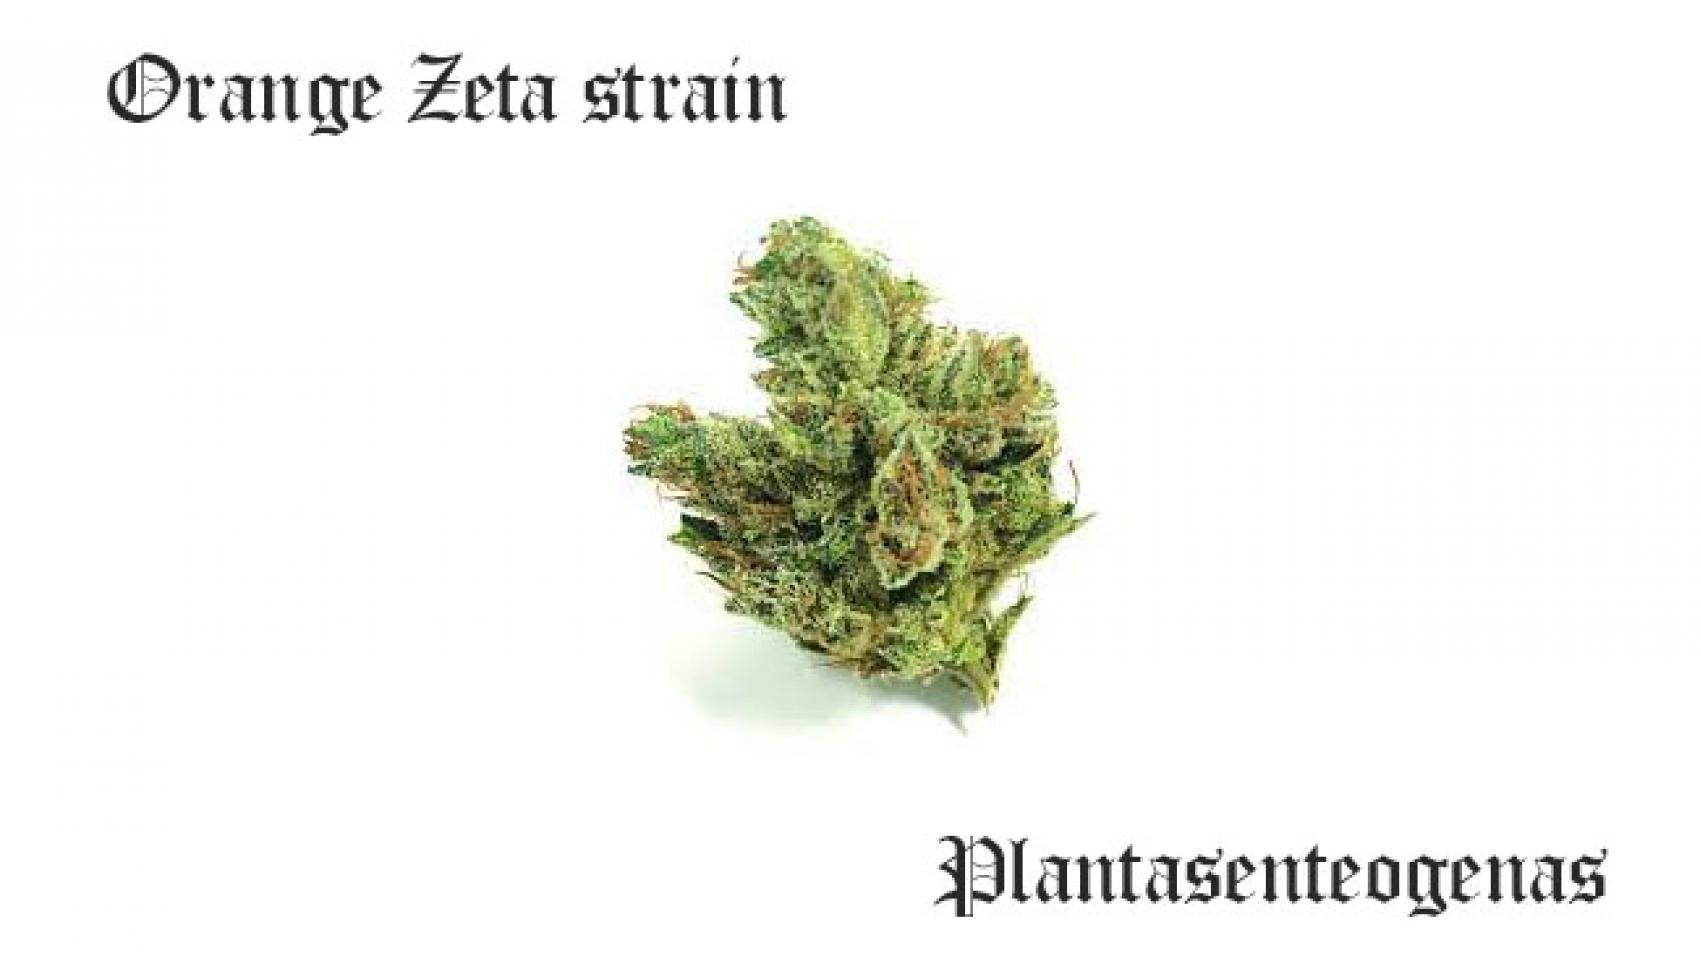 Orange Zeta strain